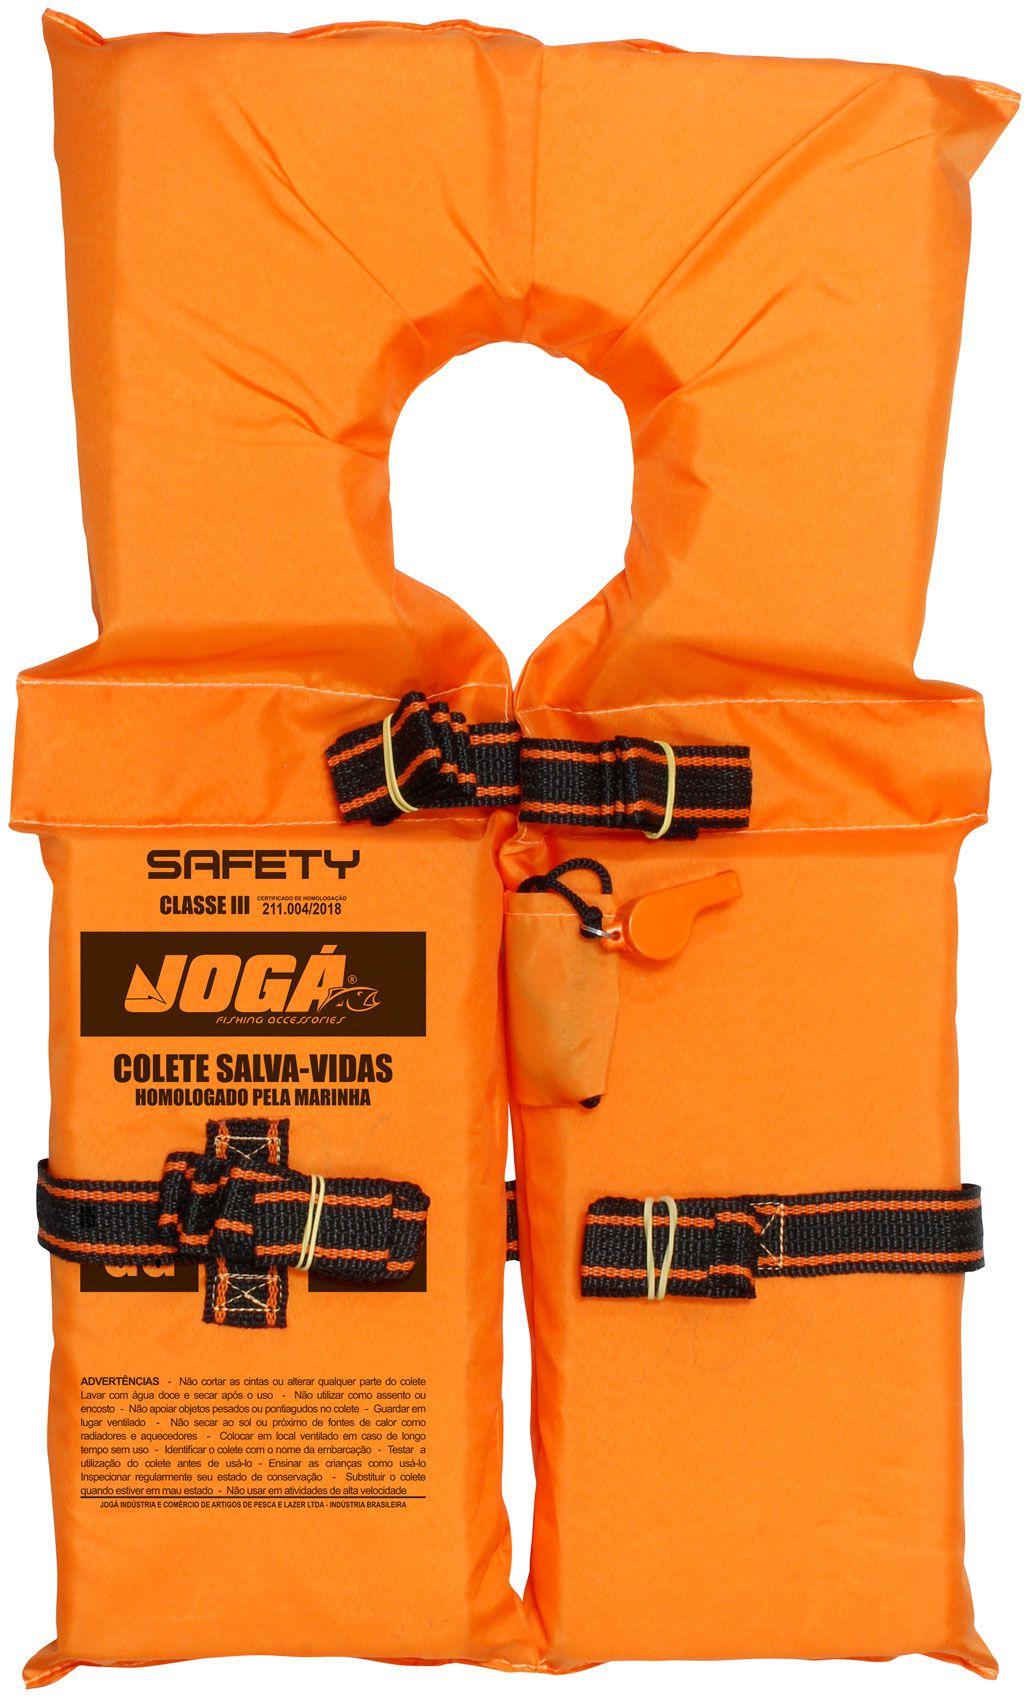 Colete Salva Vidas Jogá Classe 3 Safety Laranja - P